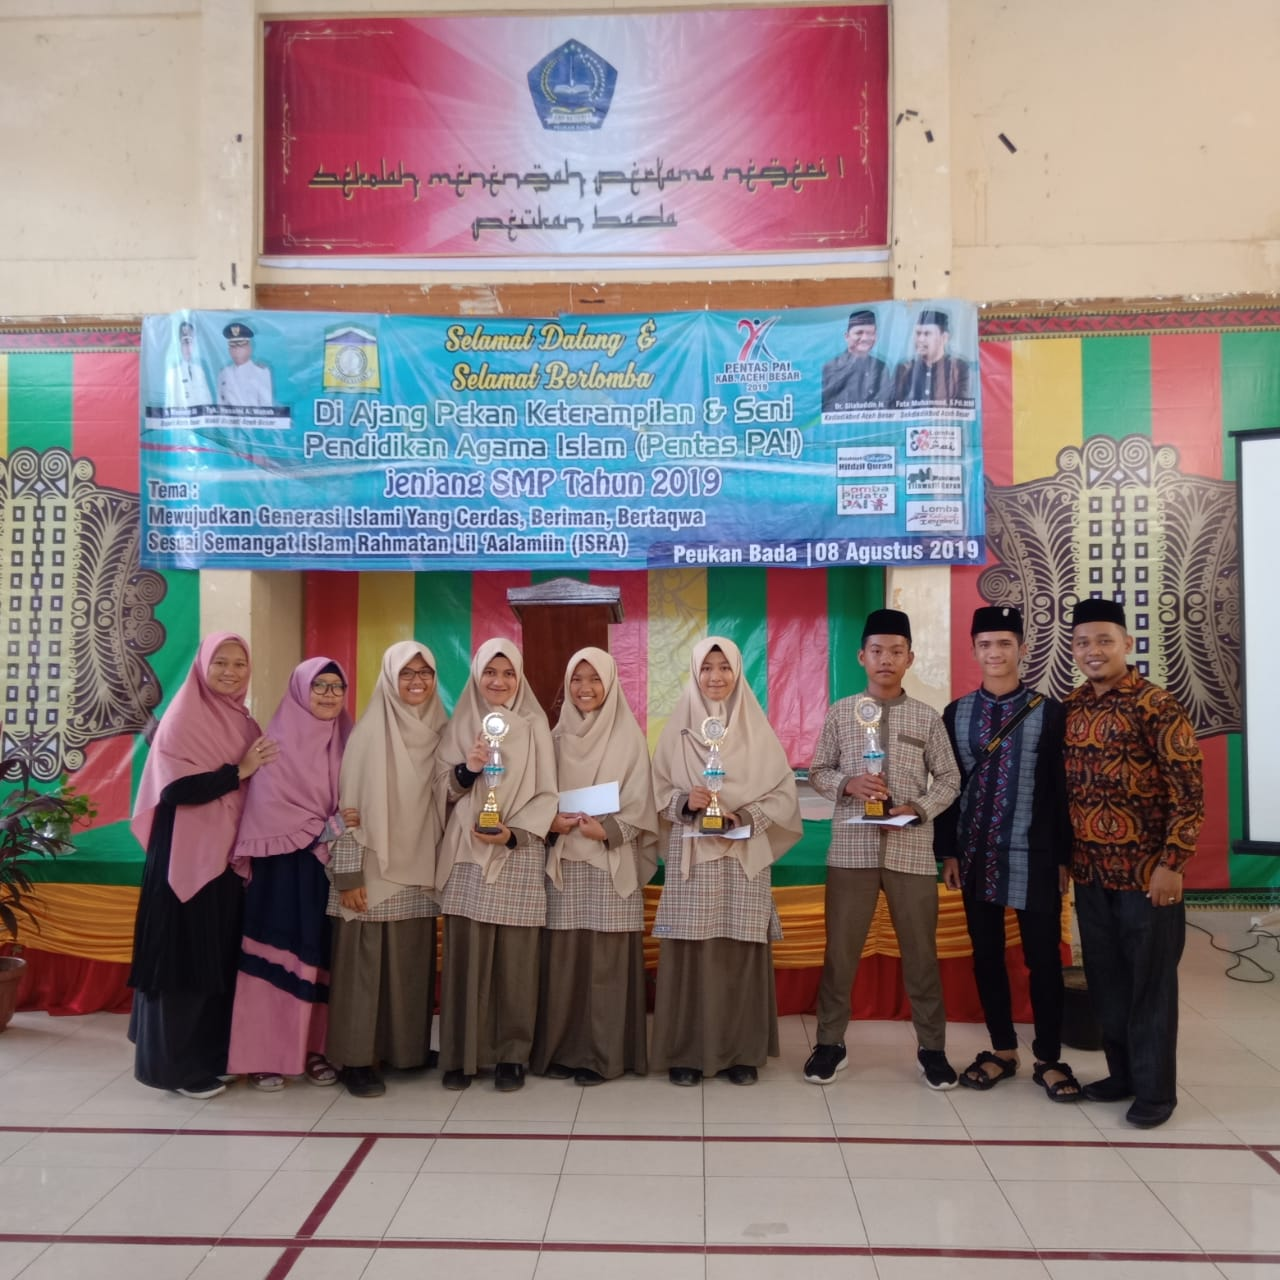 Lomba Pentas PAI tingkat Dinas Pendidikan dan Kebudayaan Aceh Besar